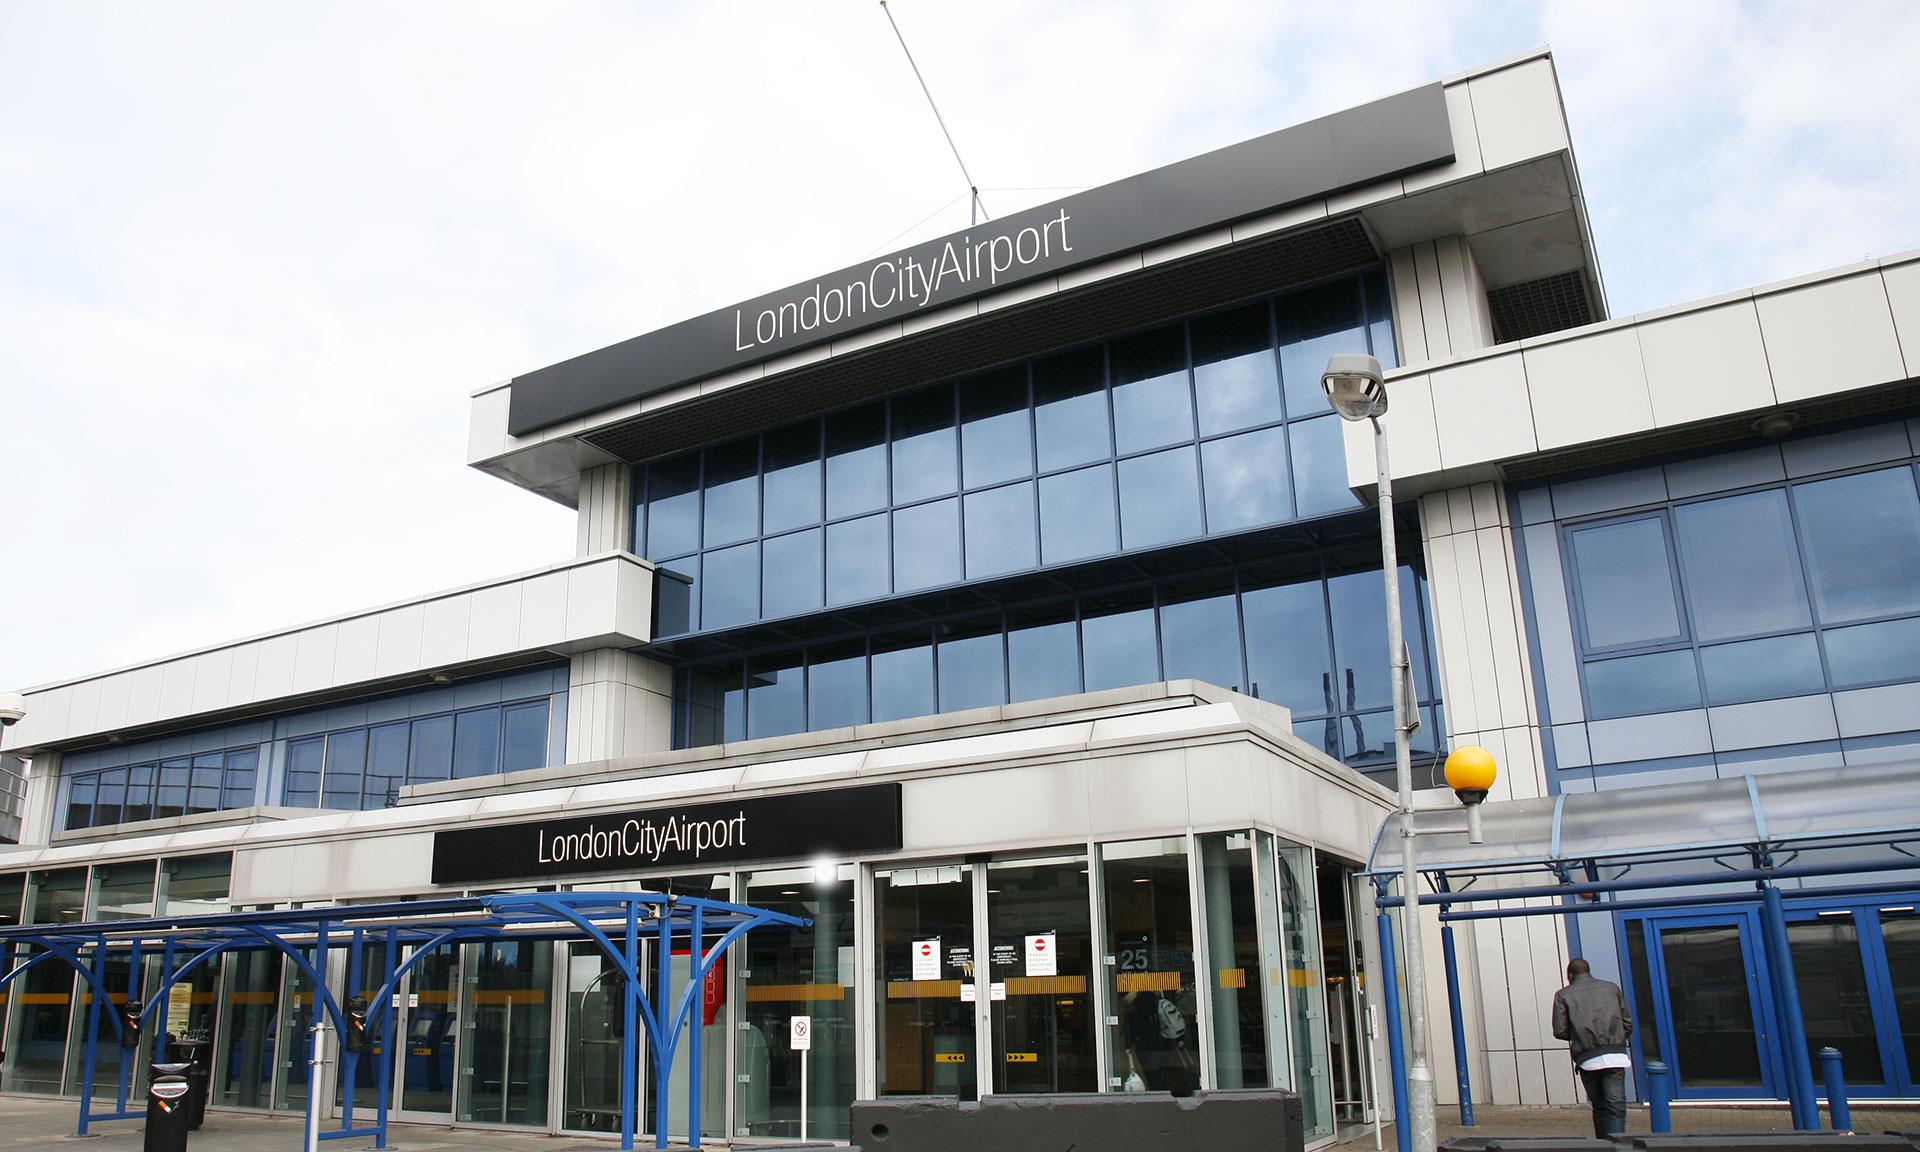 London-city-airport-1.jpg